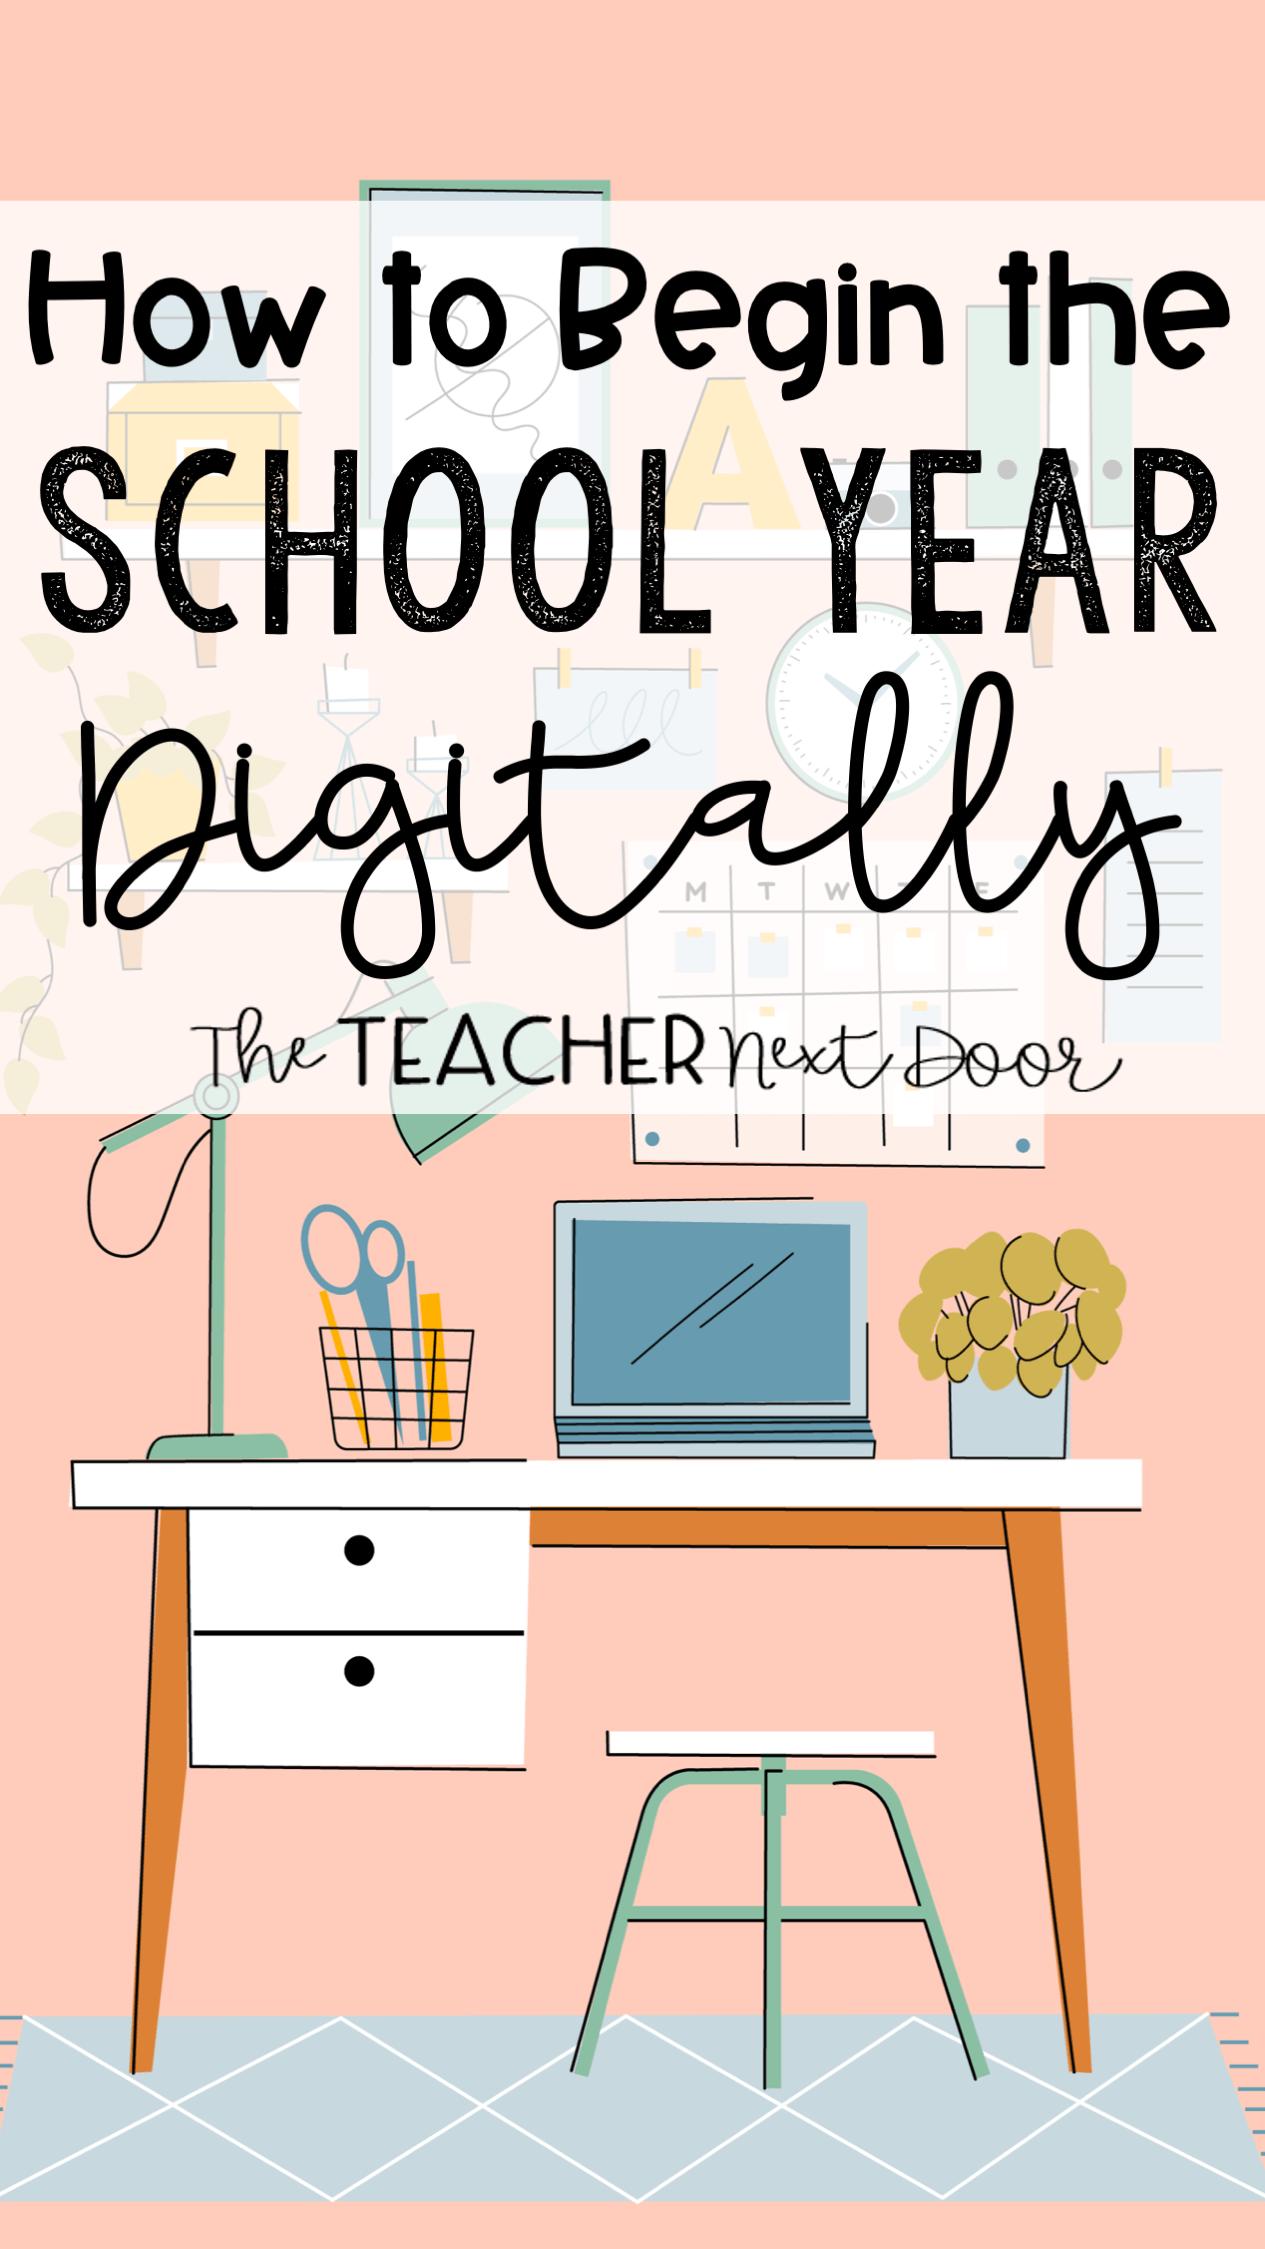 How to Begin the School Year Digitally